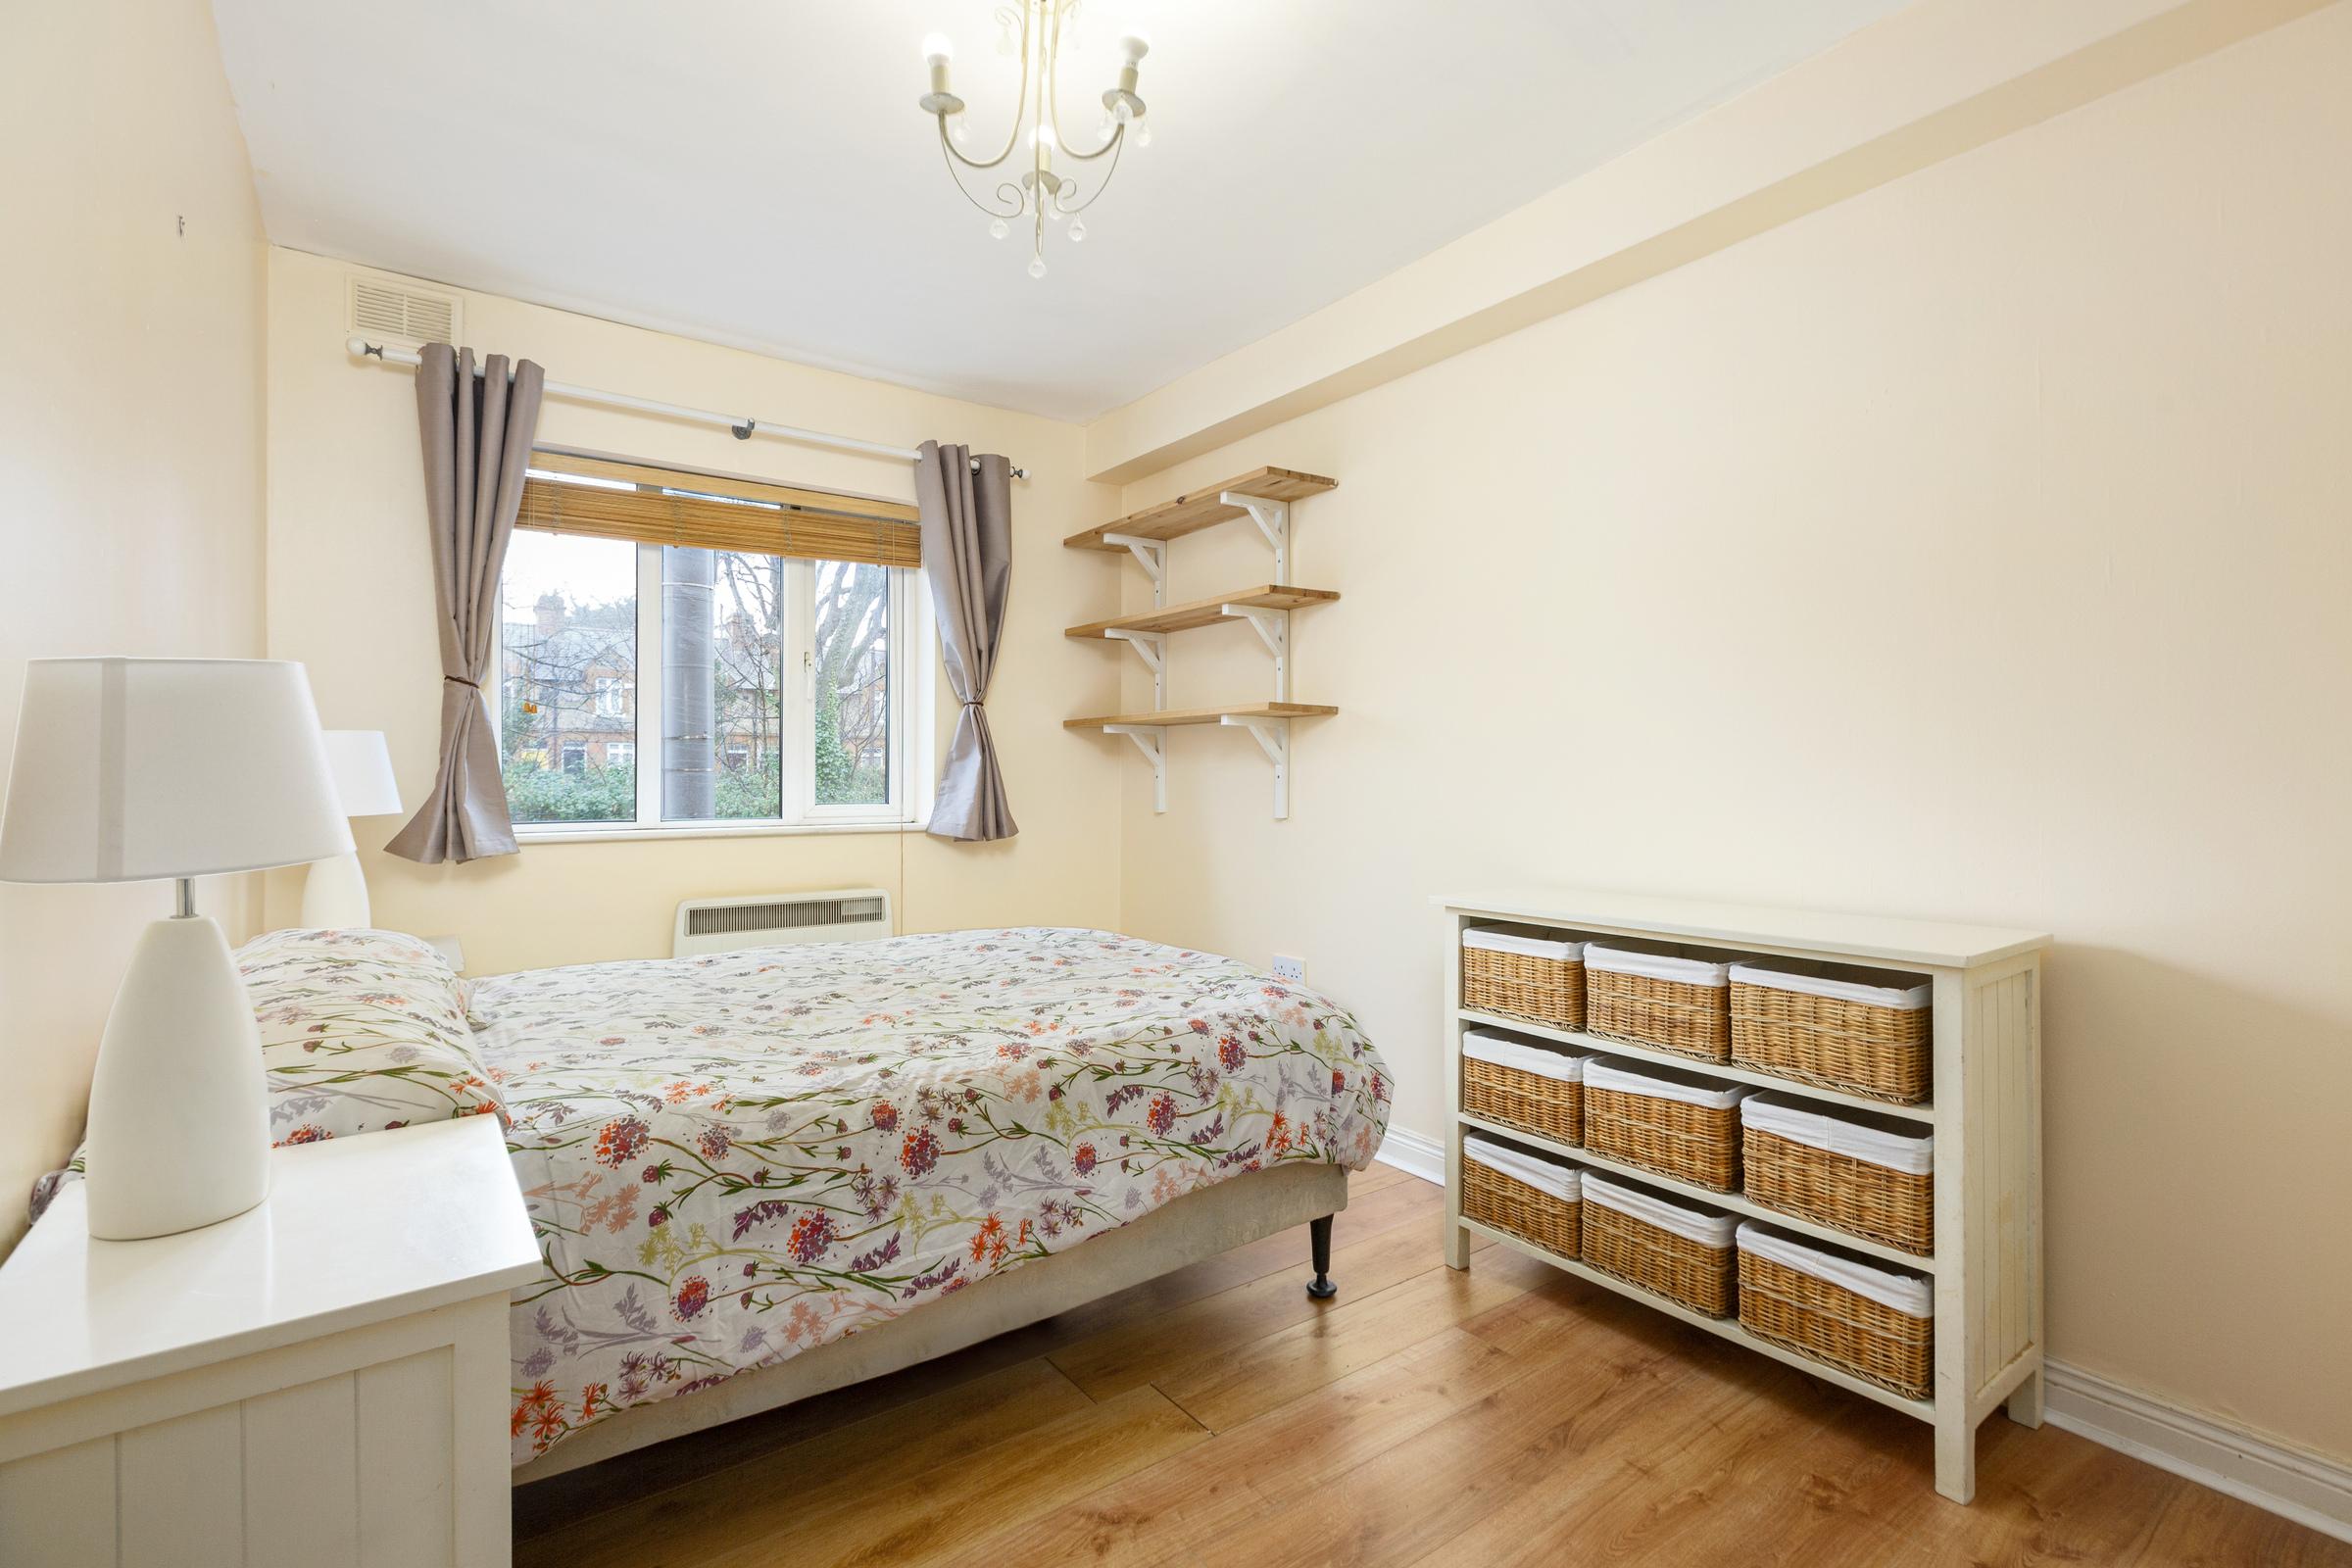 9 Angler's Rest, Beaver Row, Donnybrook, Dublin 4